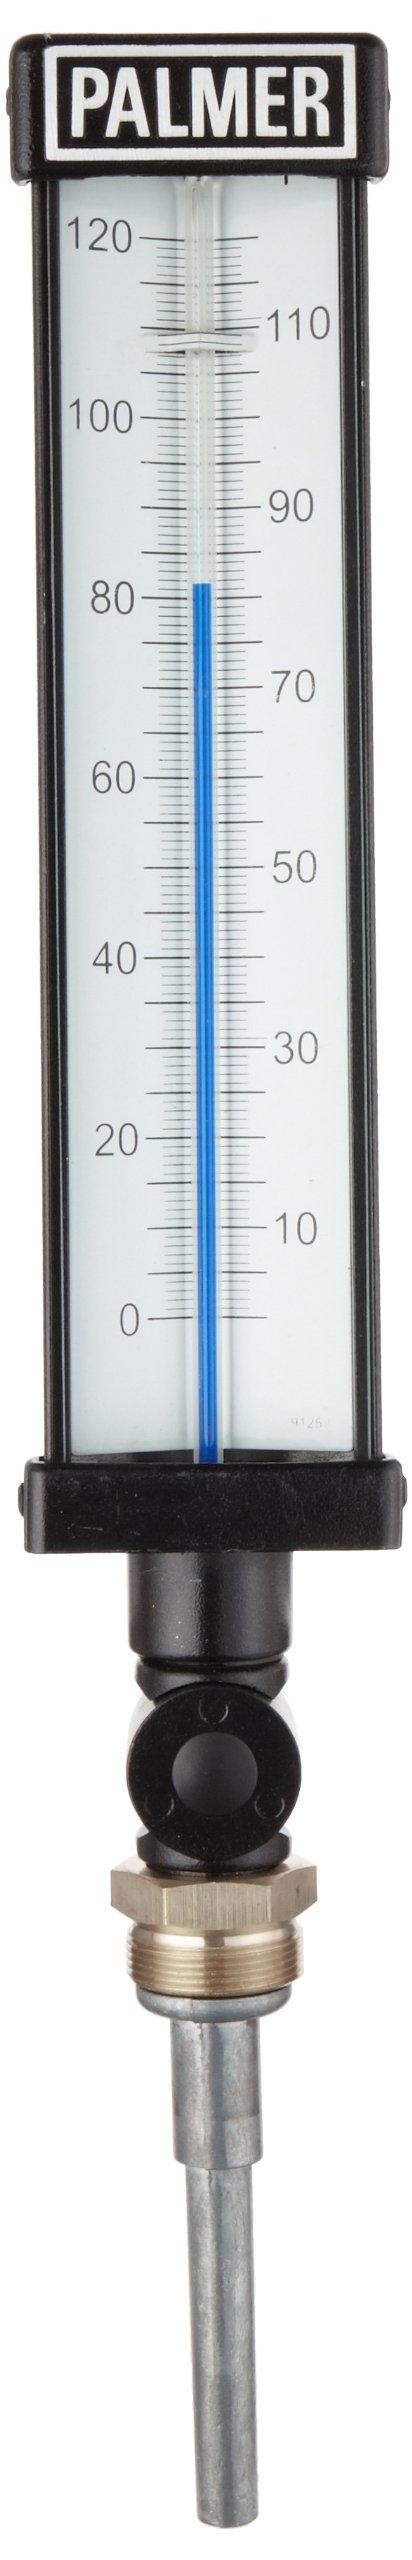 Palmer 9ALSB3.50/120F Aluminum Economy Industrial Thermometer, Spirit Fill, 3.5'' Stem, 9'' Scale Case, 0-120 Degrees F Temperature Range